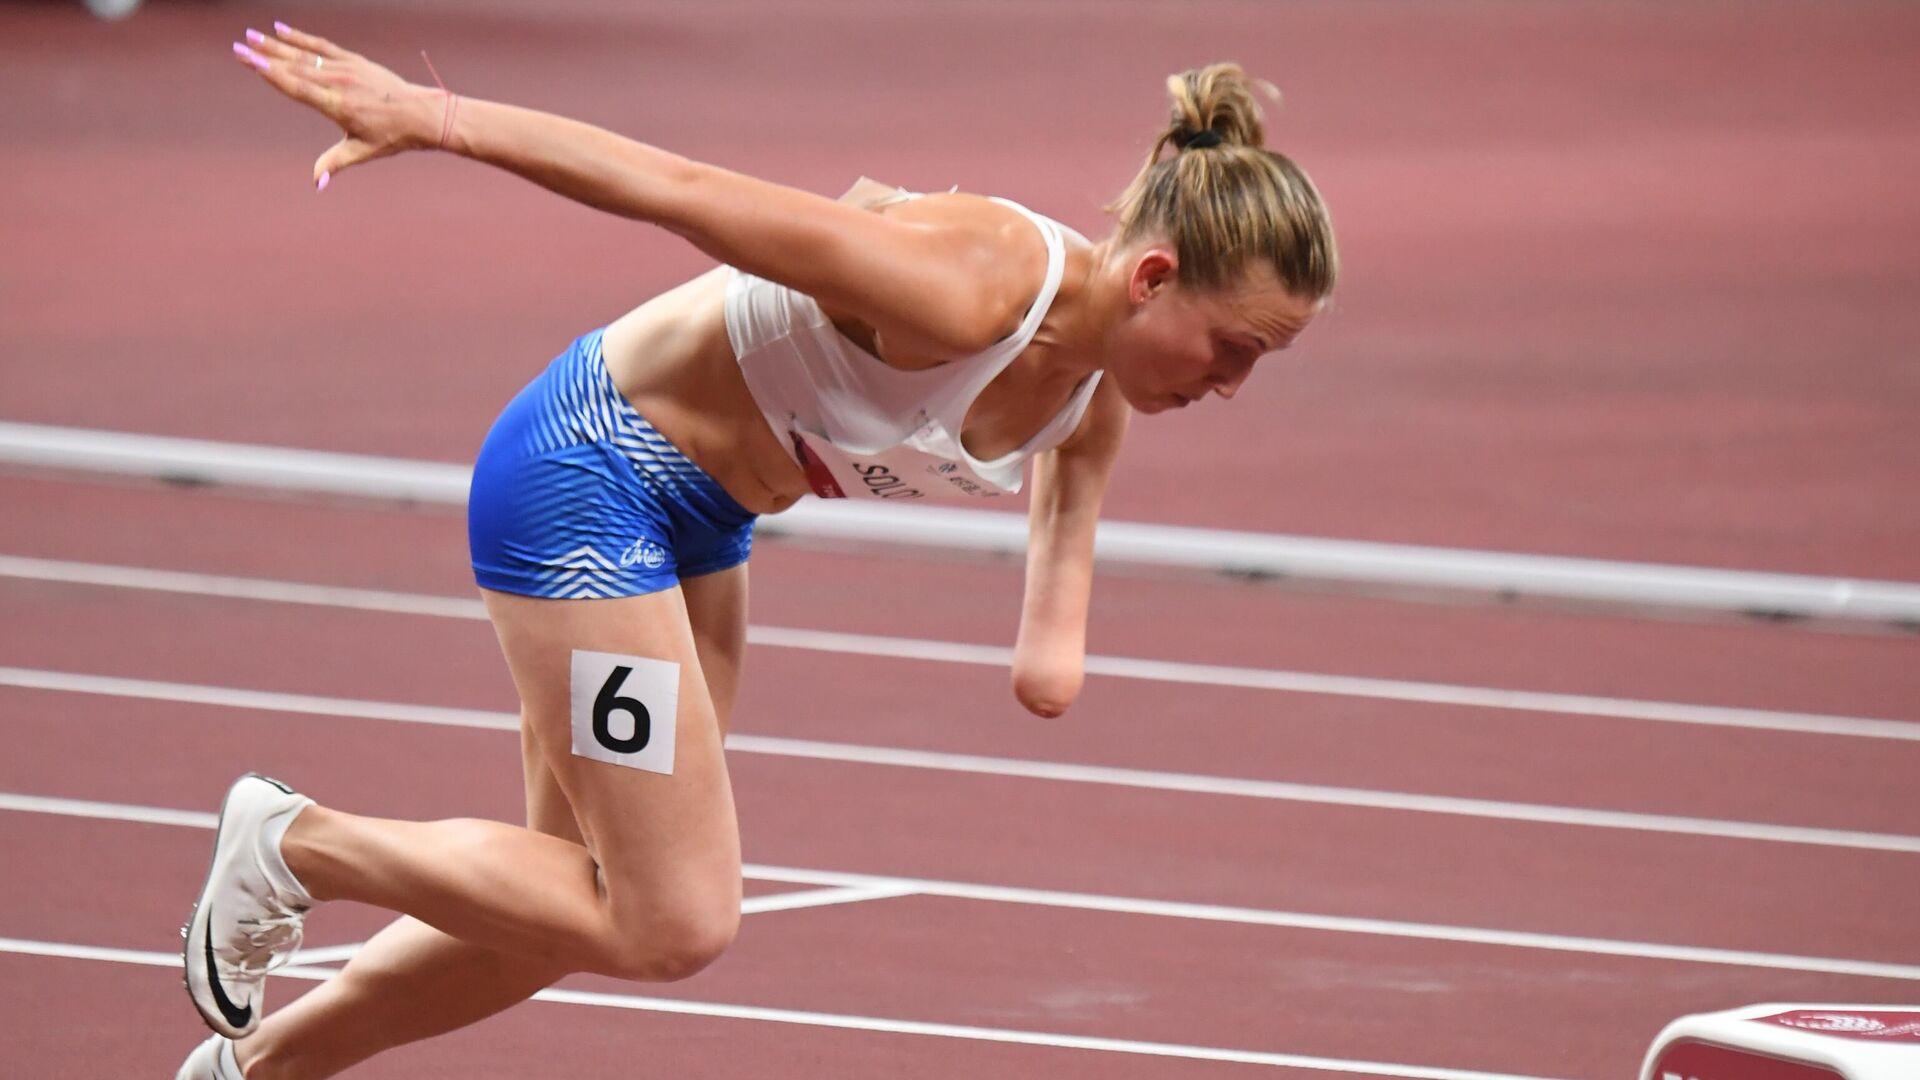 Rus atlet Anastasya Solovyova - Sputnik Türkiye, 1920, 29.08.2021